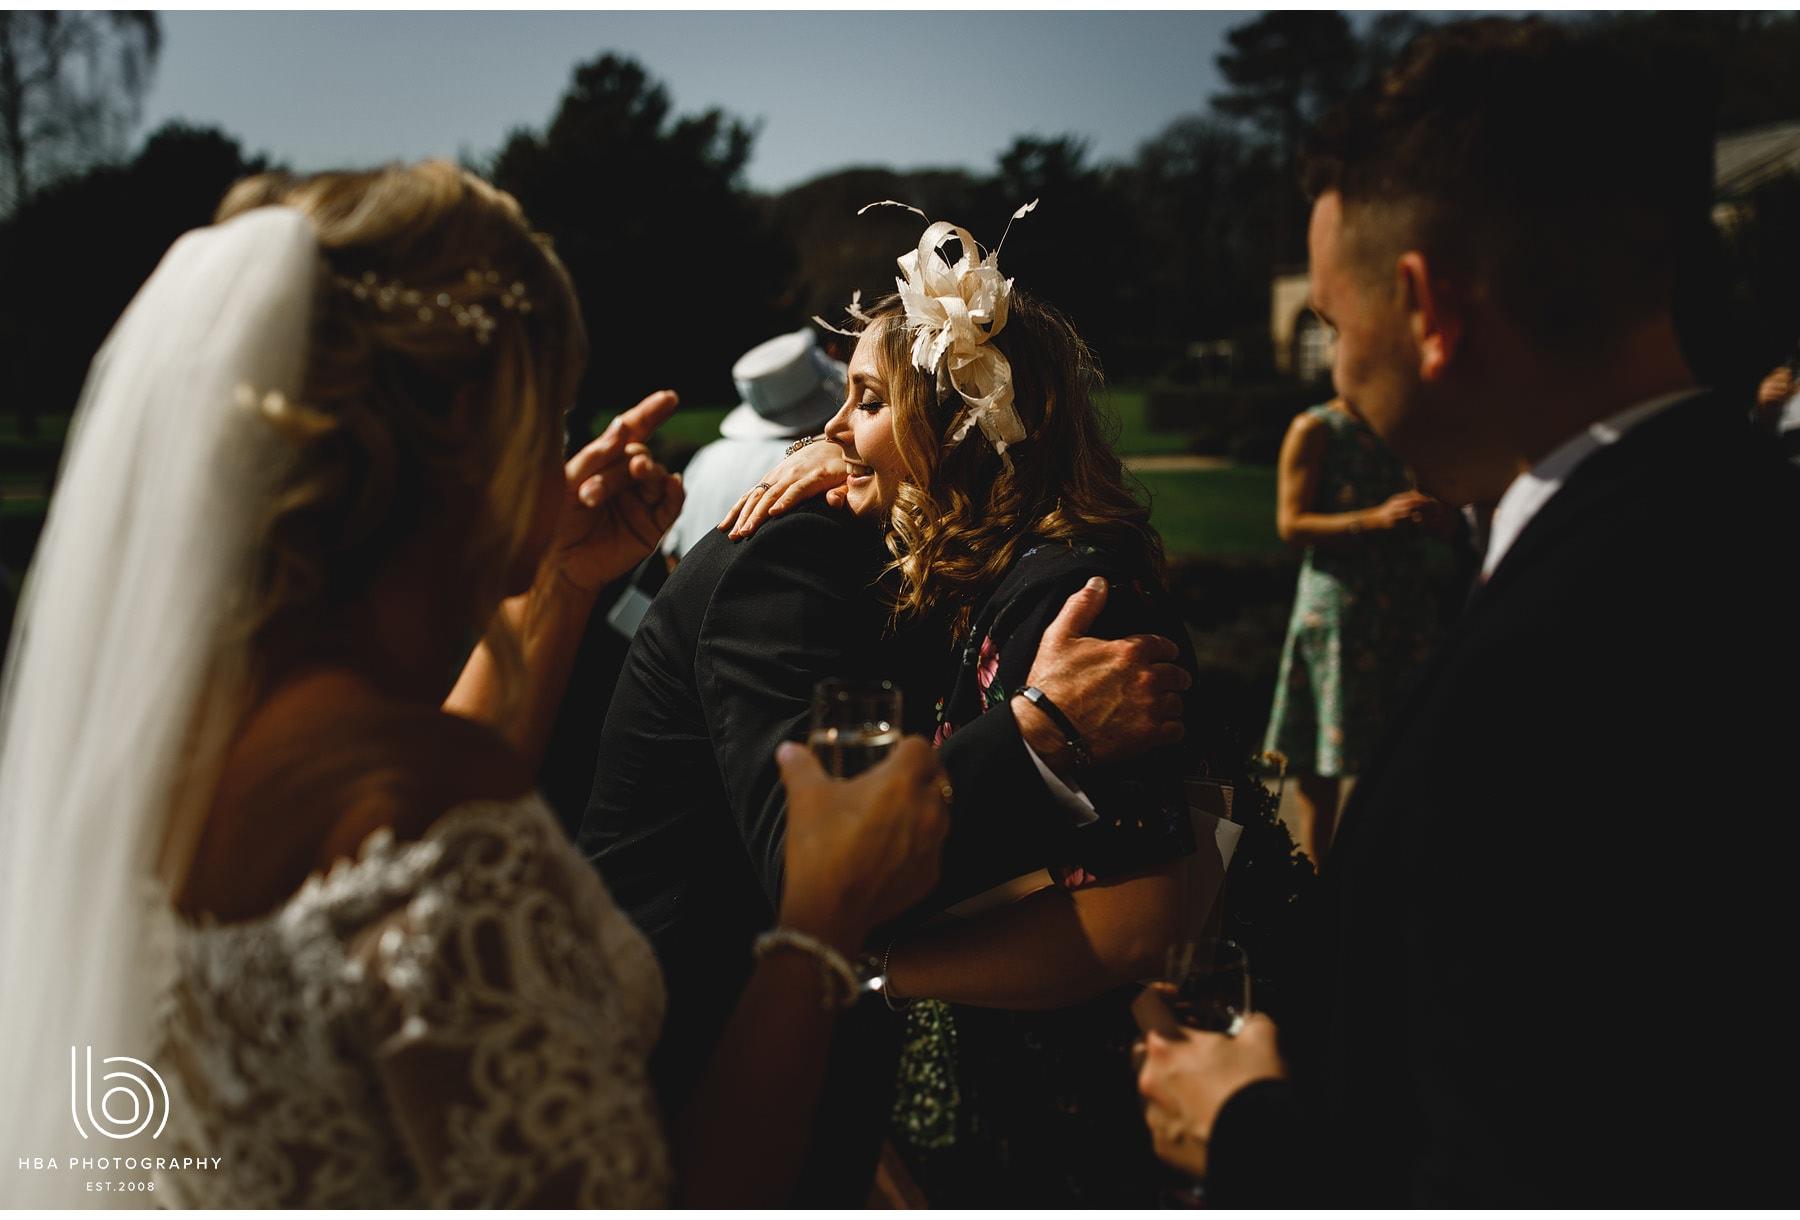 hugging wedding guests